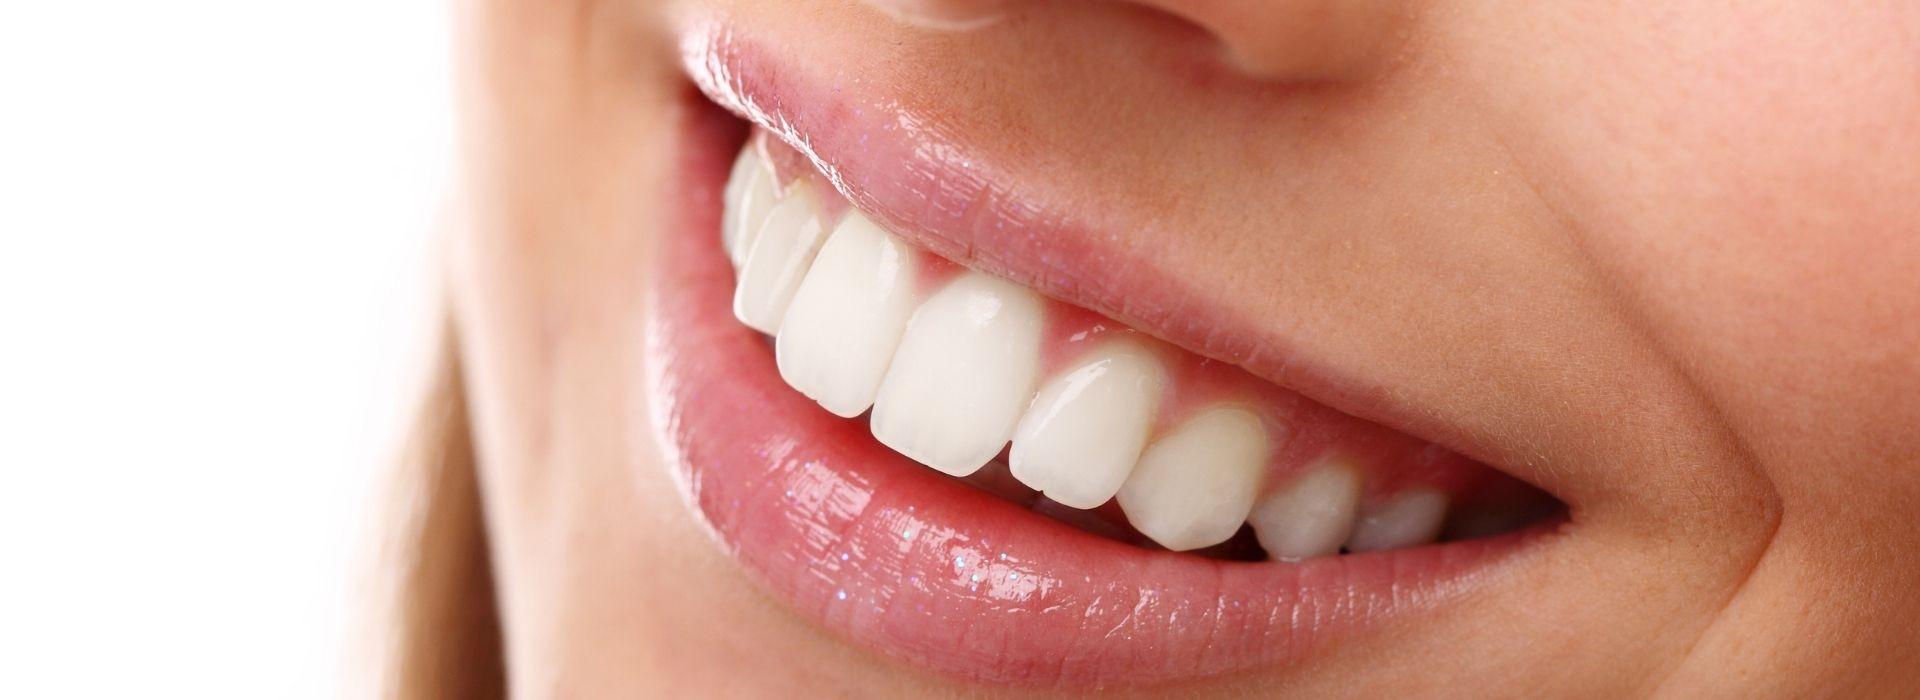 teeth whitening clinic